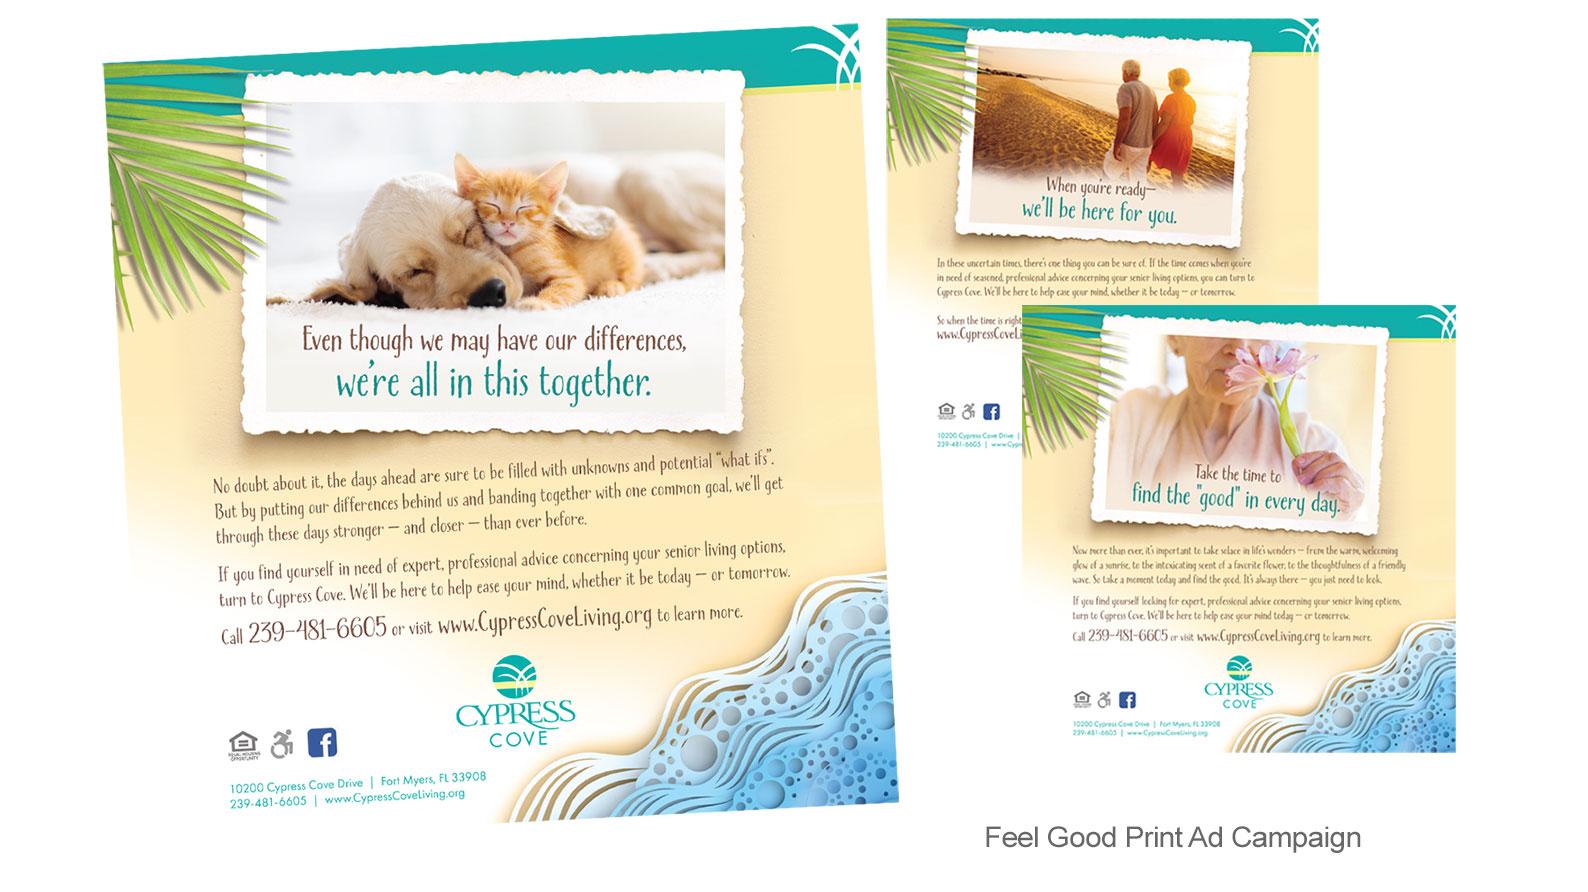 Cypress Cove print ad campaign